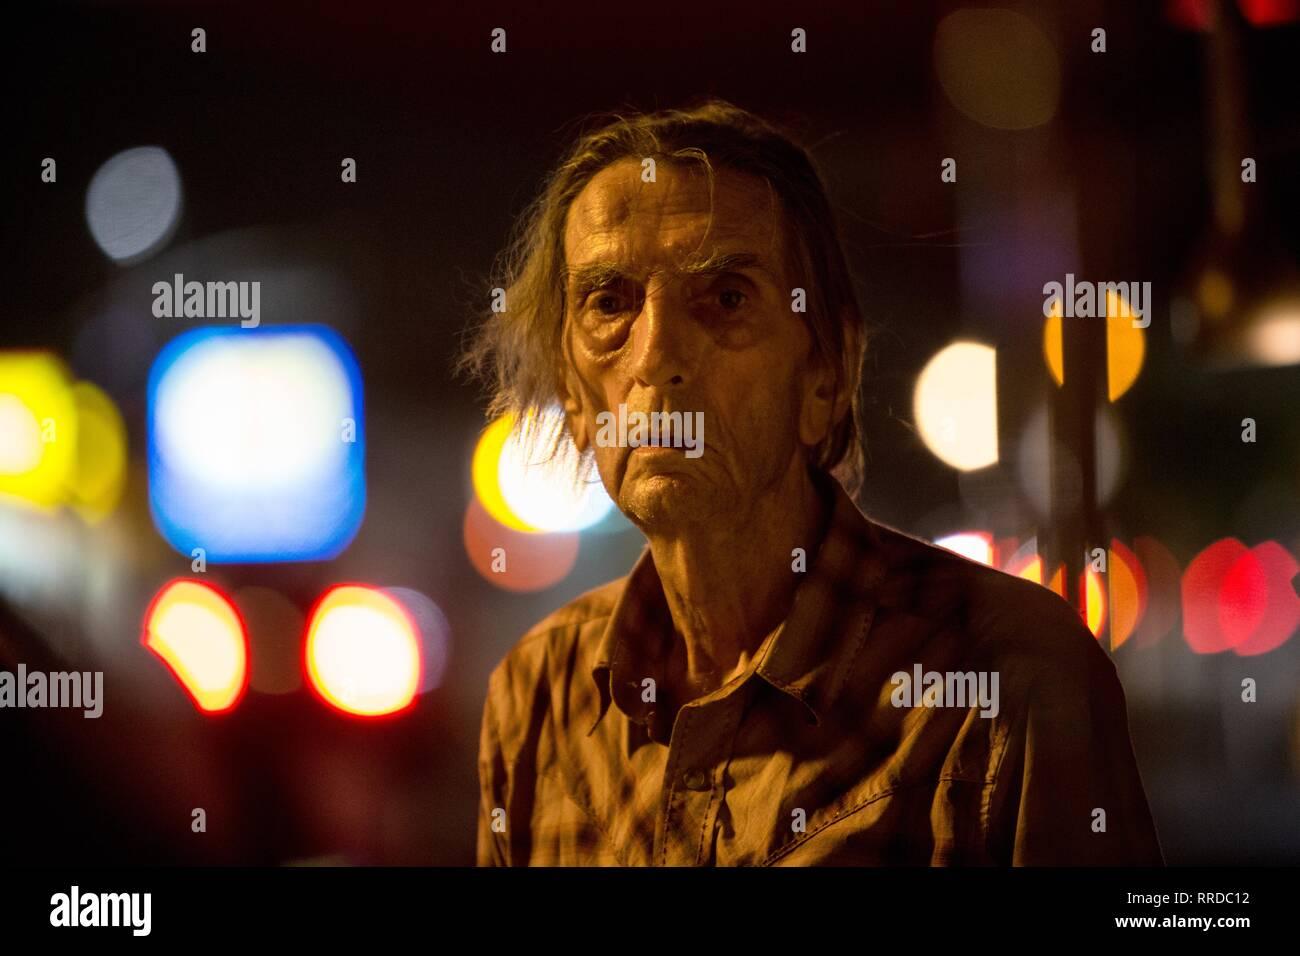 LUCKY, HARRY DEAN STANTON, 2017 - Stock Image